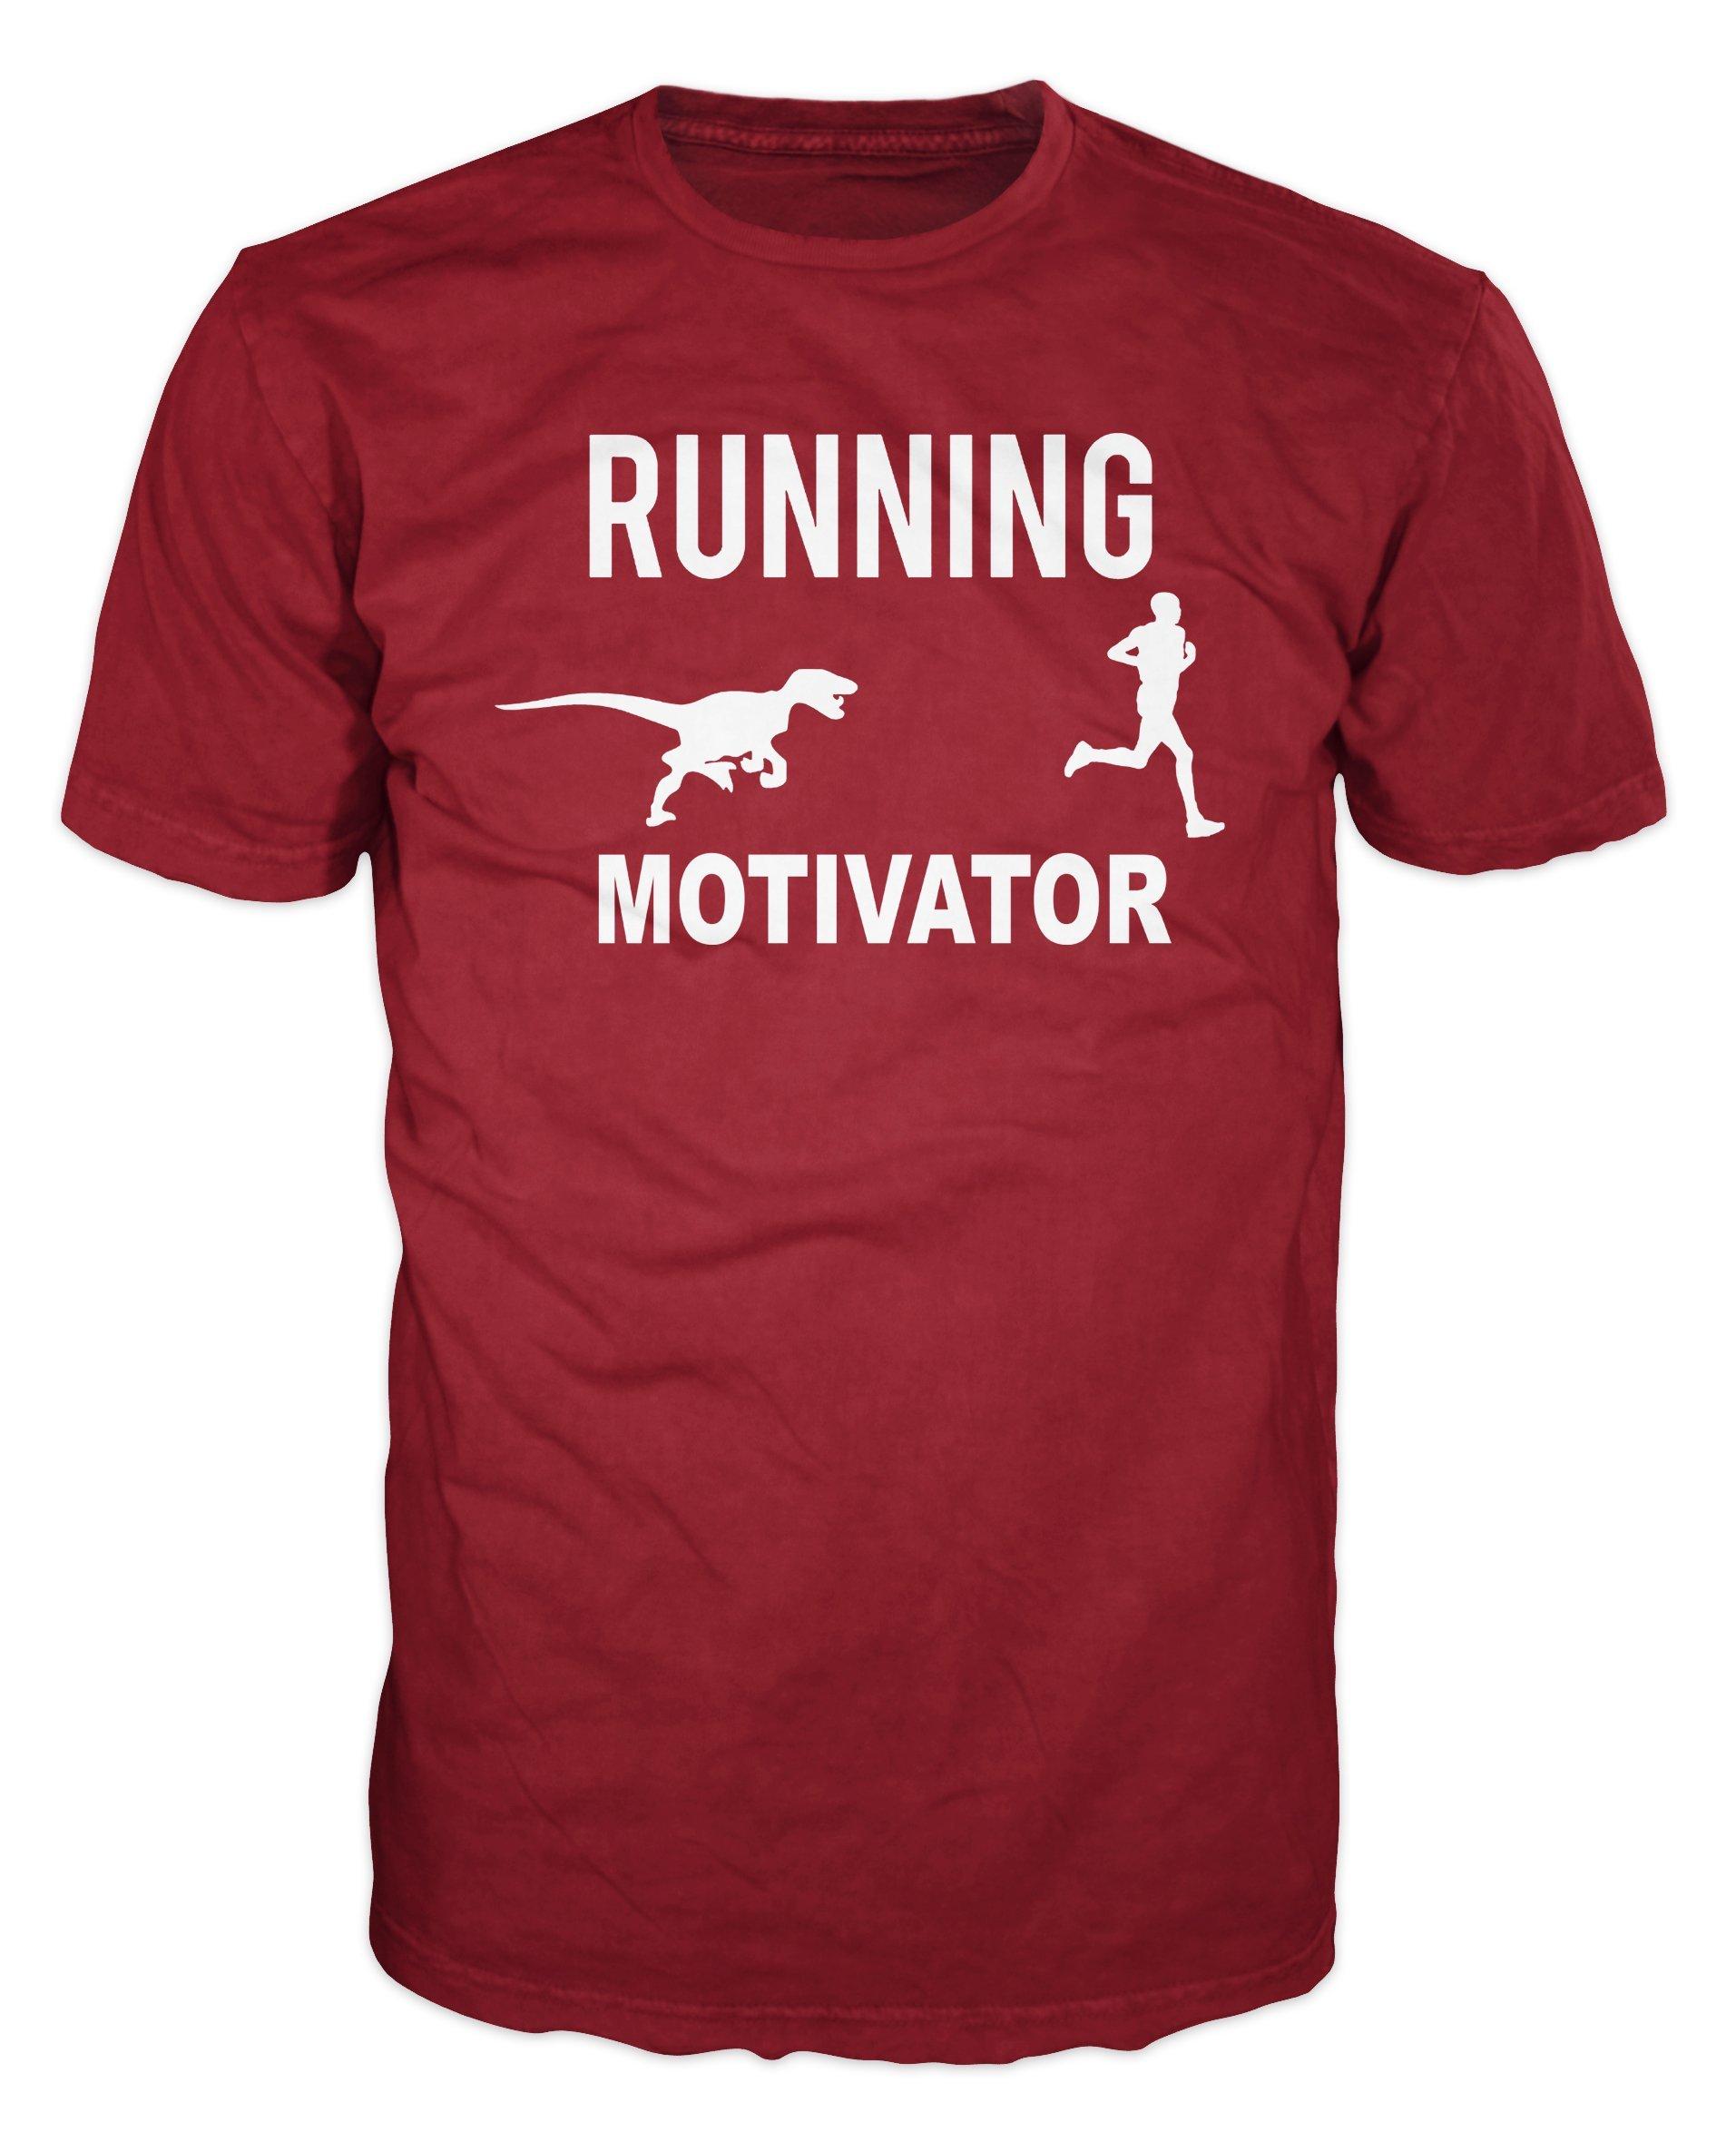 Dalesbury Running Motivation Raptor And Runner Funny Tshirt Brick Red